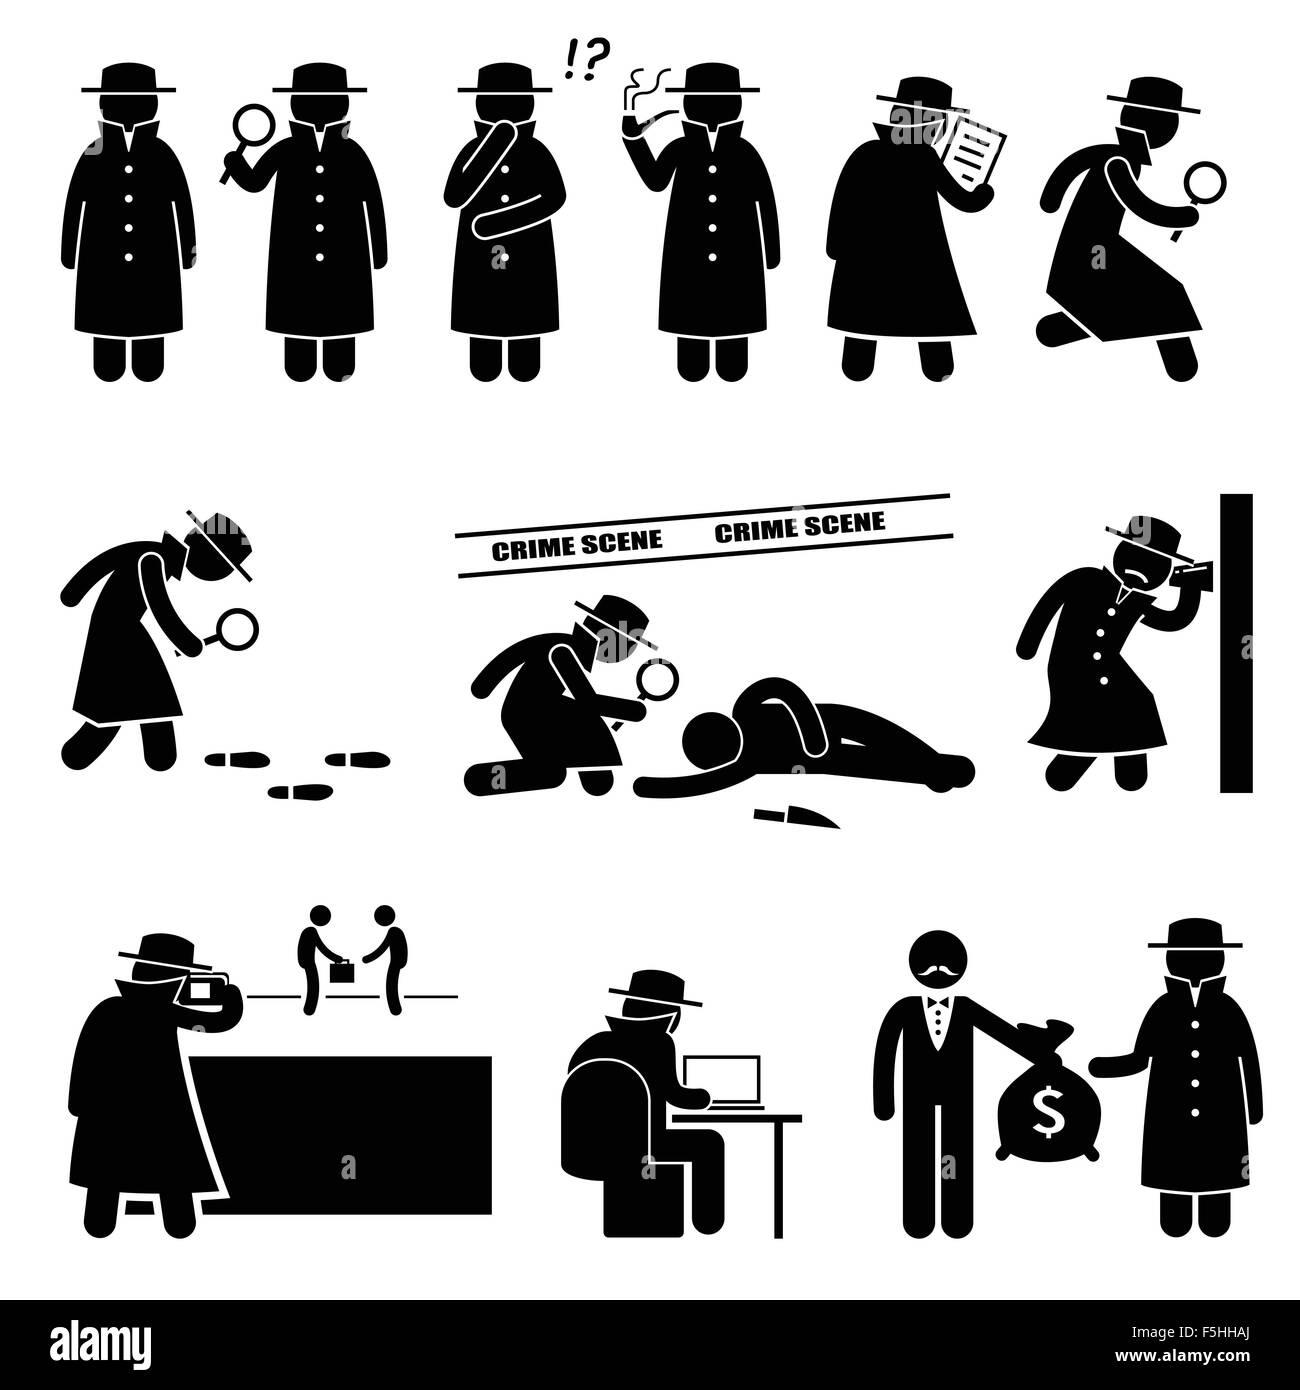 Detective Spy Private Investigator Stick Figure Pictogram Icons - Stock Image